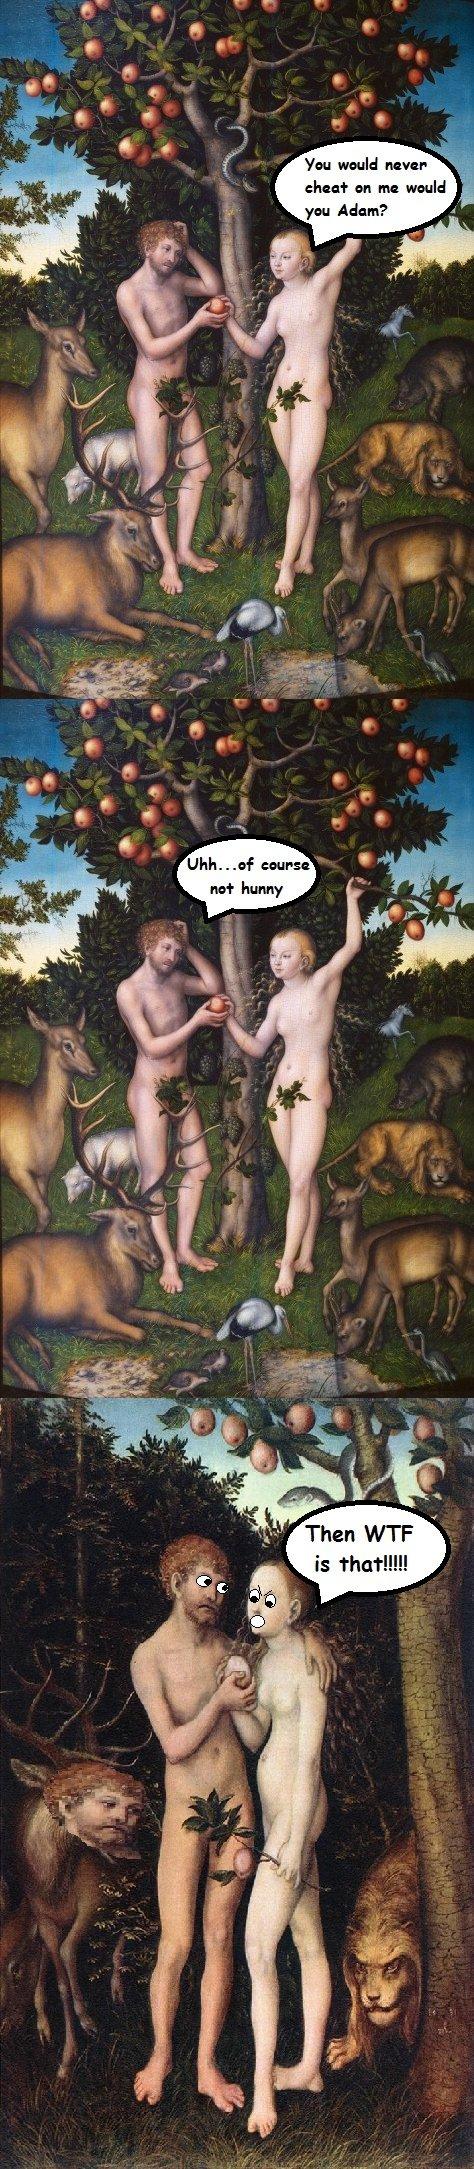 Adam and Eve. . YE 'Ware never ahead' an m: 18' ari gnu Adam? nu'? Huang; adam and eve